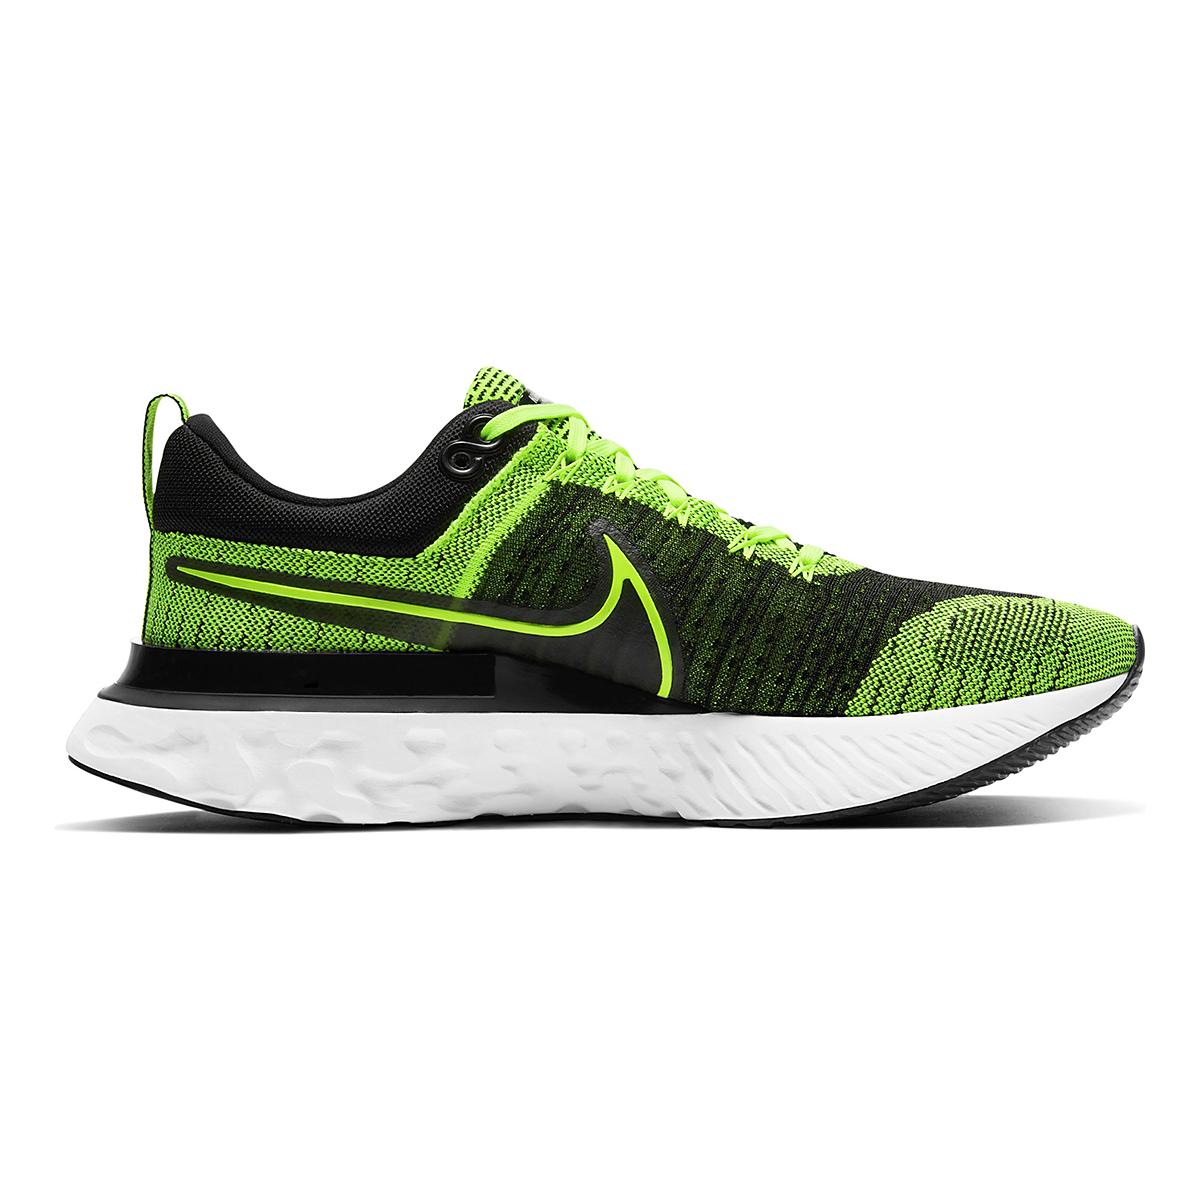 Men's Nike React Infinity Run Flyknit 2 Running Shoe - Color: Volt/Black - Size: 6 - Width: Regular, Volt/Black, large, image 1